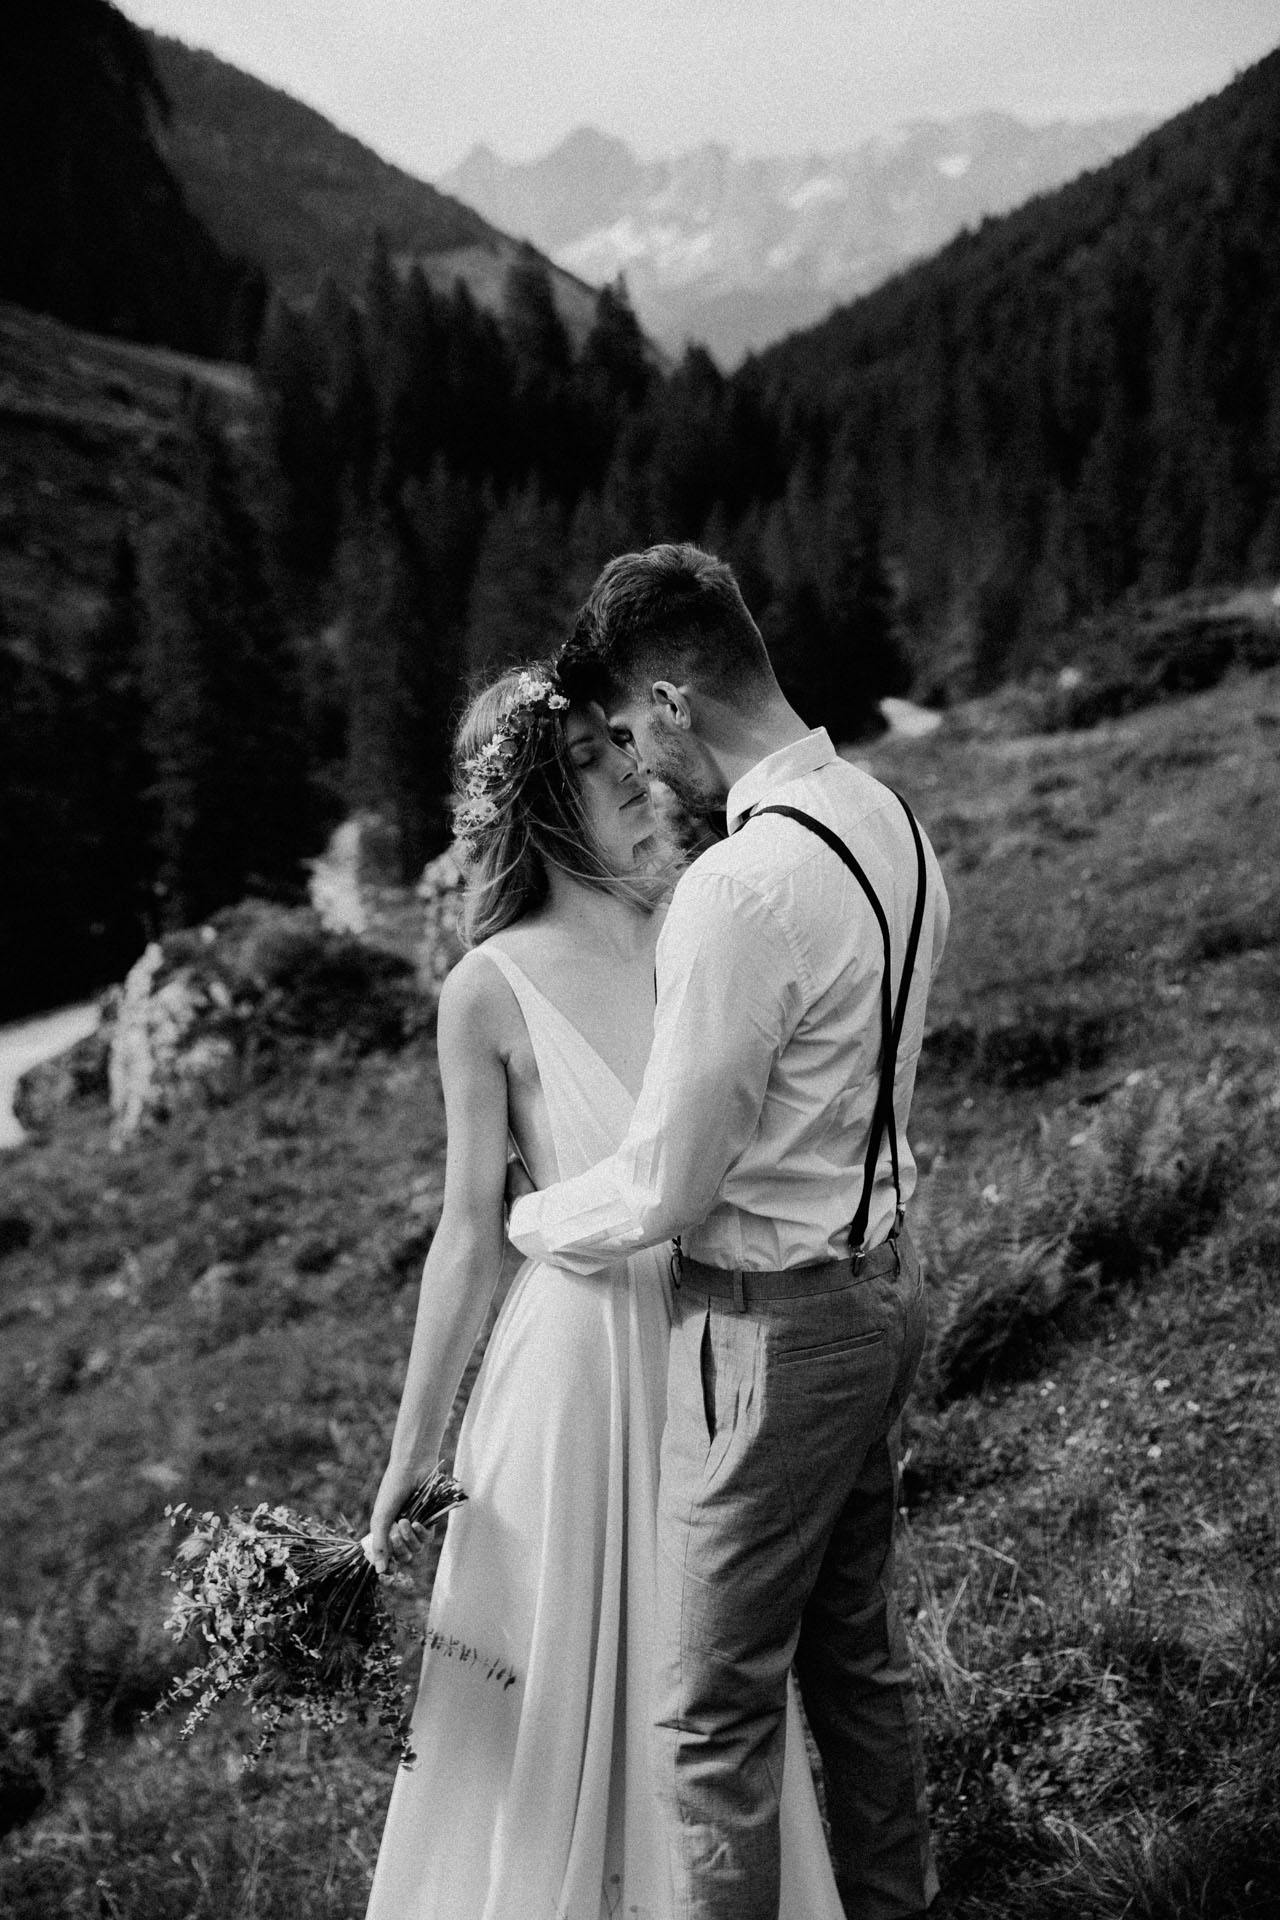 vienna-wedding-photographer-agnesundandi-weddingshooting-schladming-13